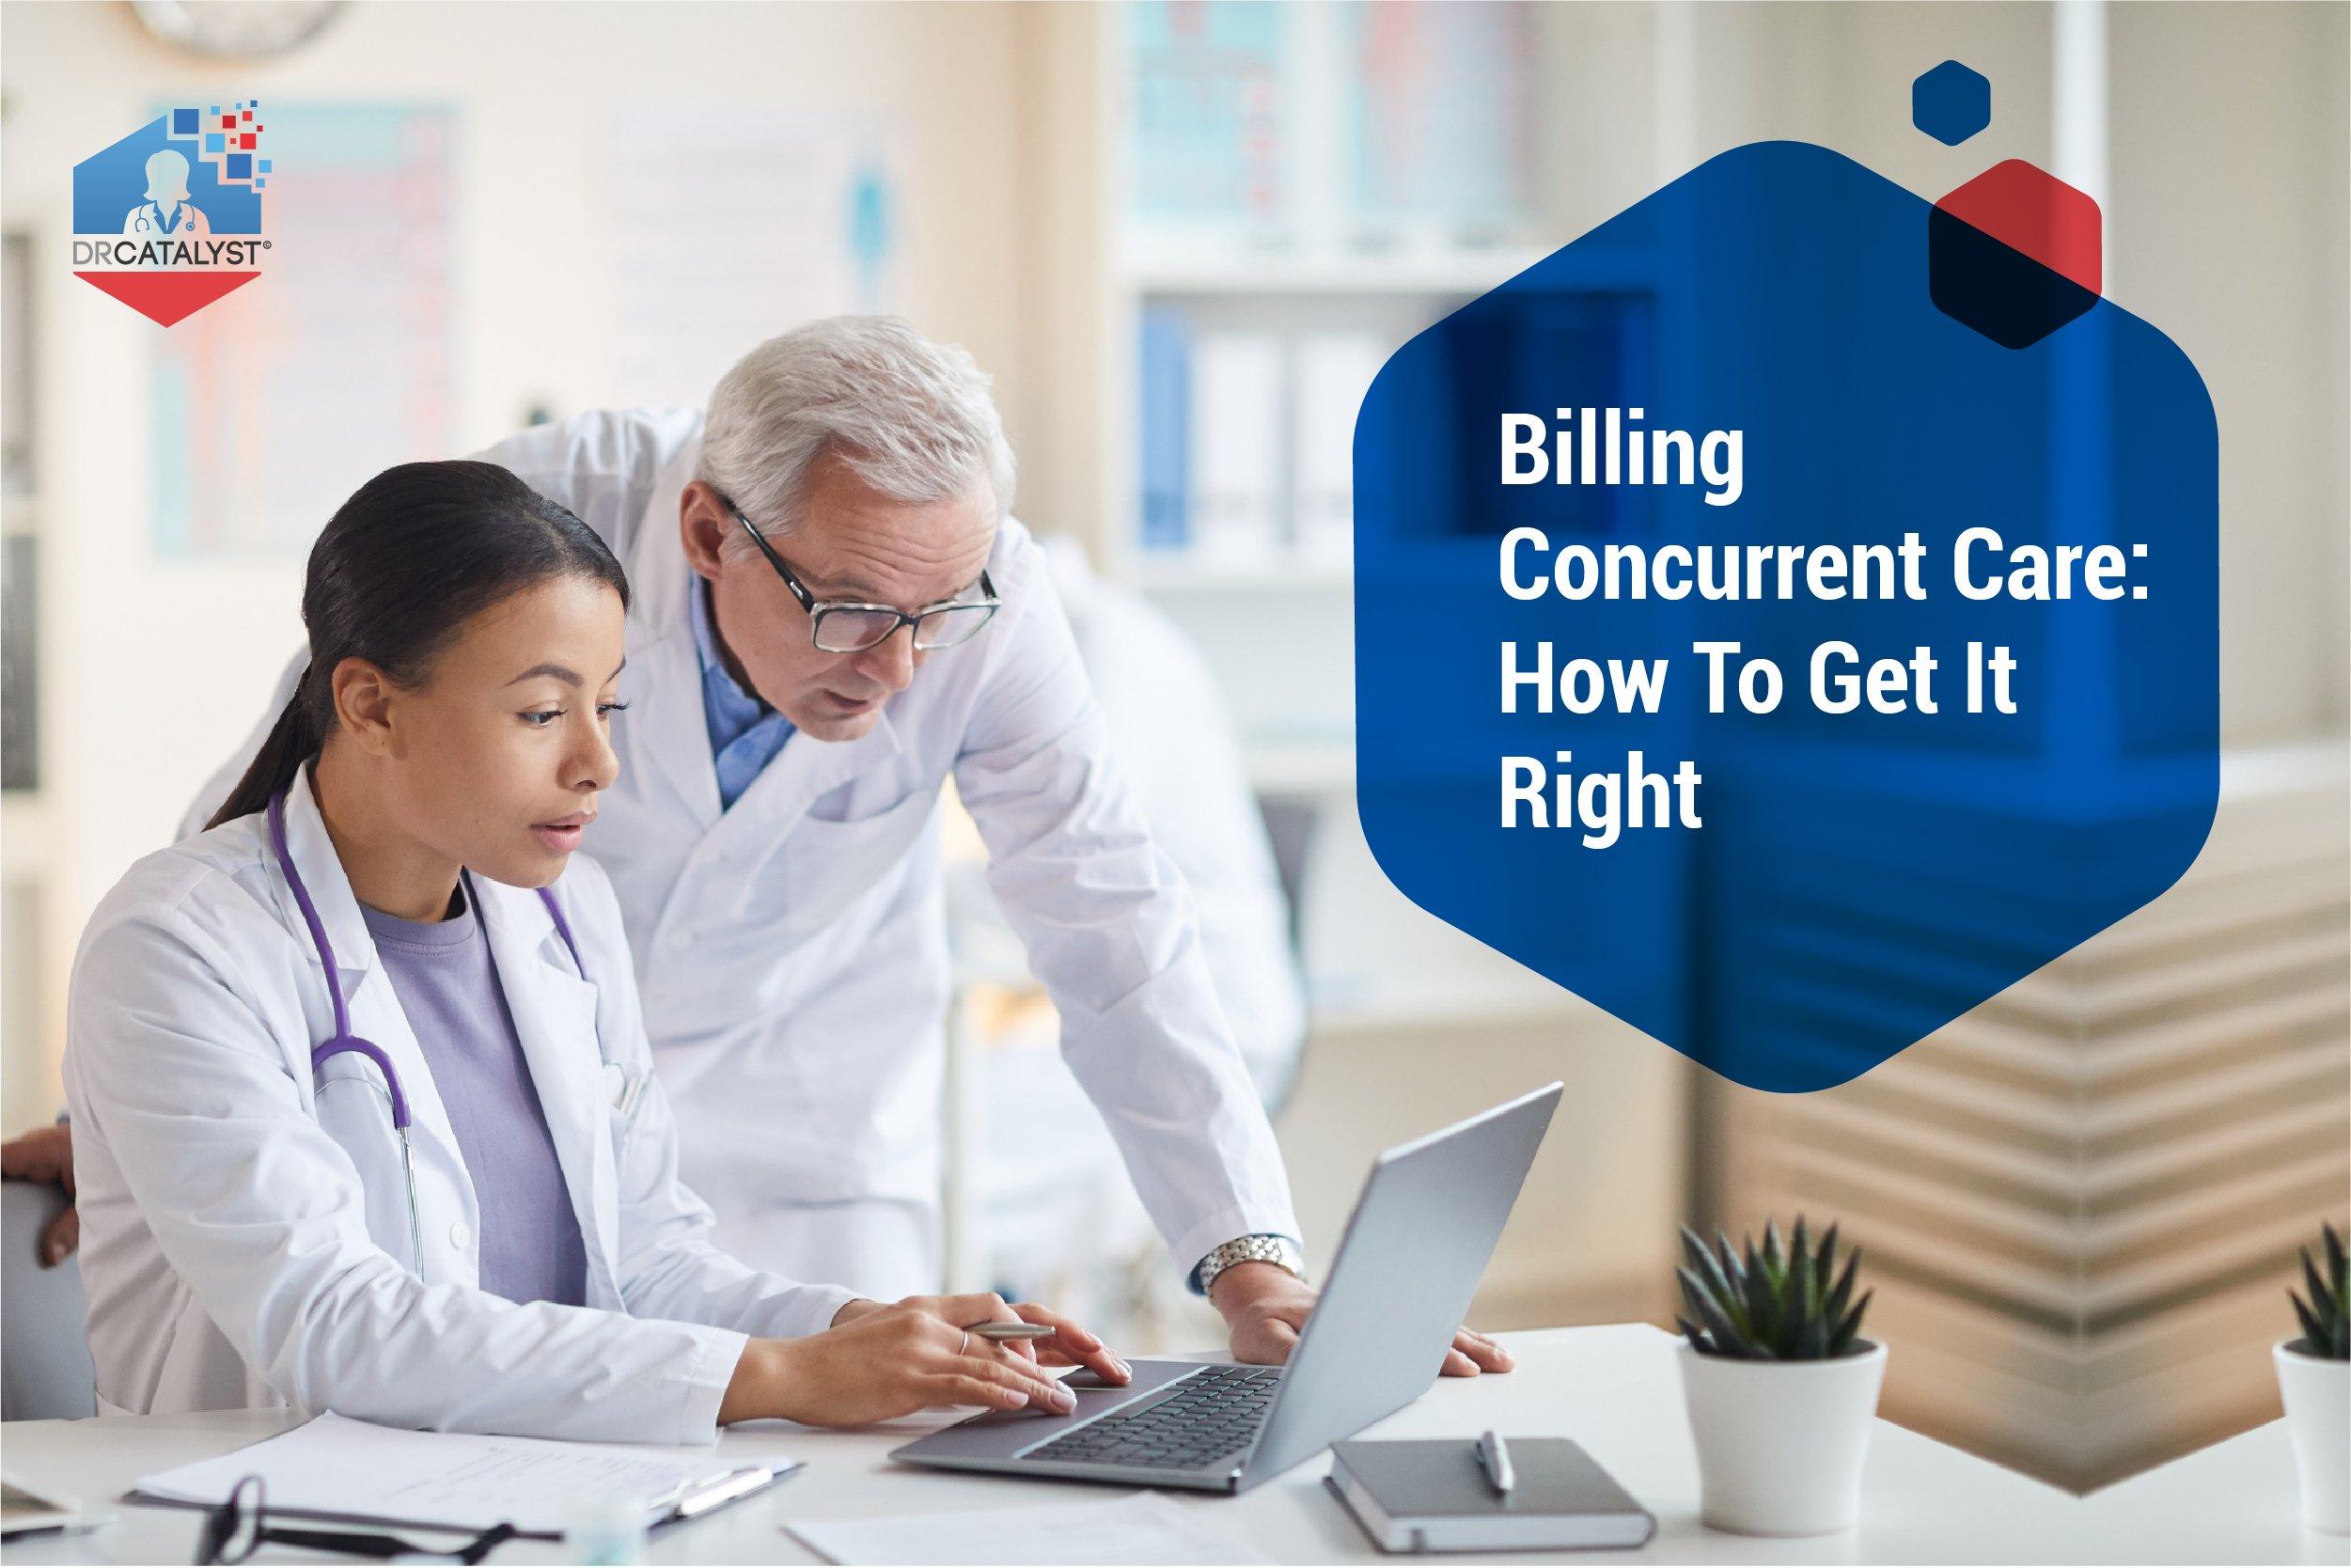 Billing Concurrent Care